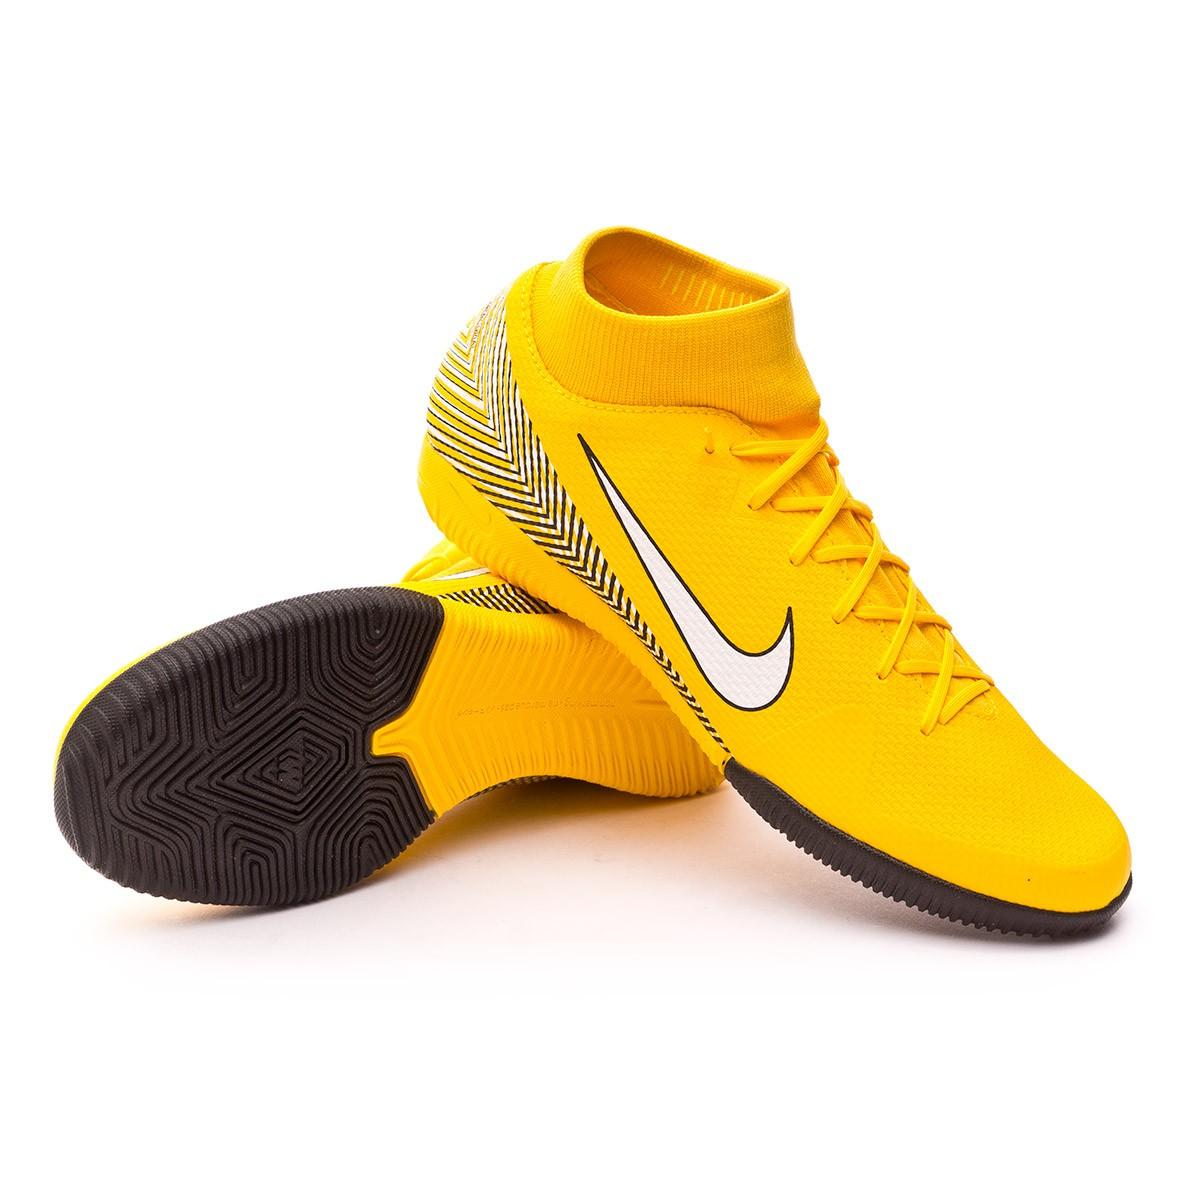 f4524464c Futsal Boot Nike Mercurial SuperflyX VI Academy IC Neymar Yellow-Black -  Football store Fútbol Emotion